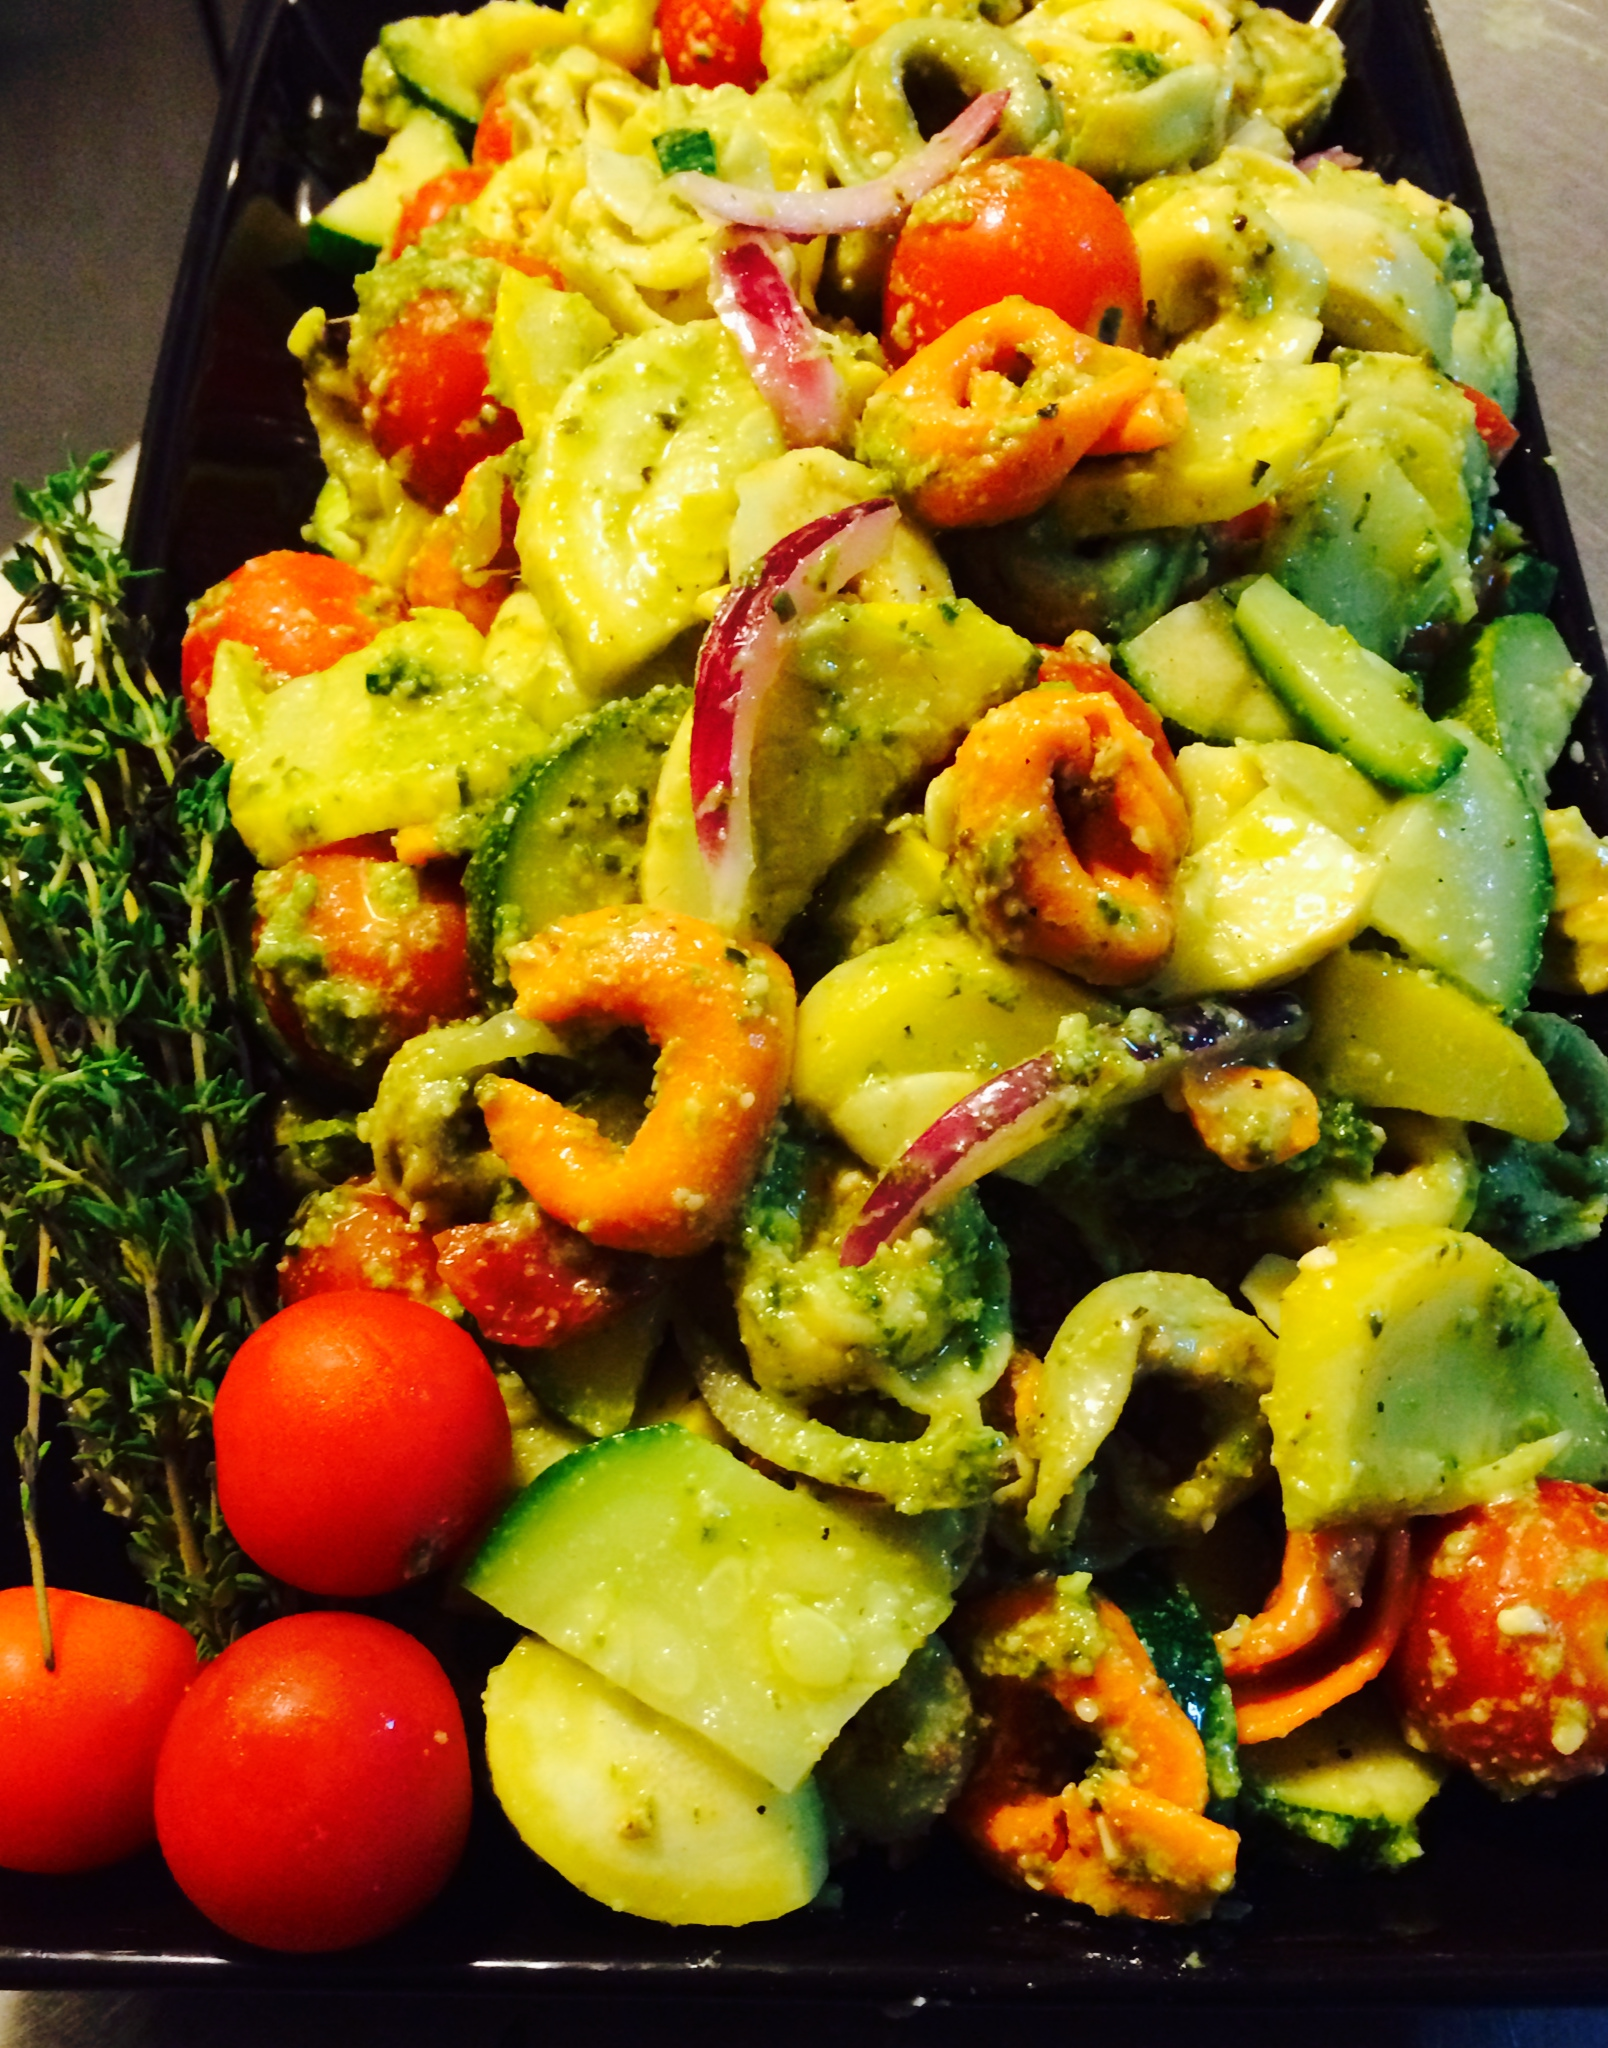 tort salad.jpg